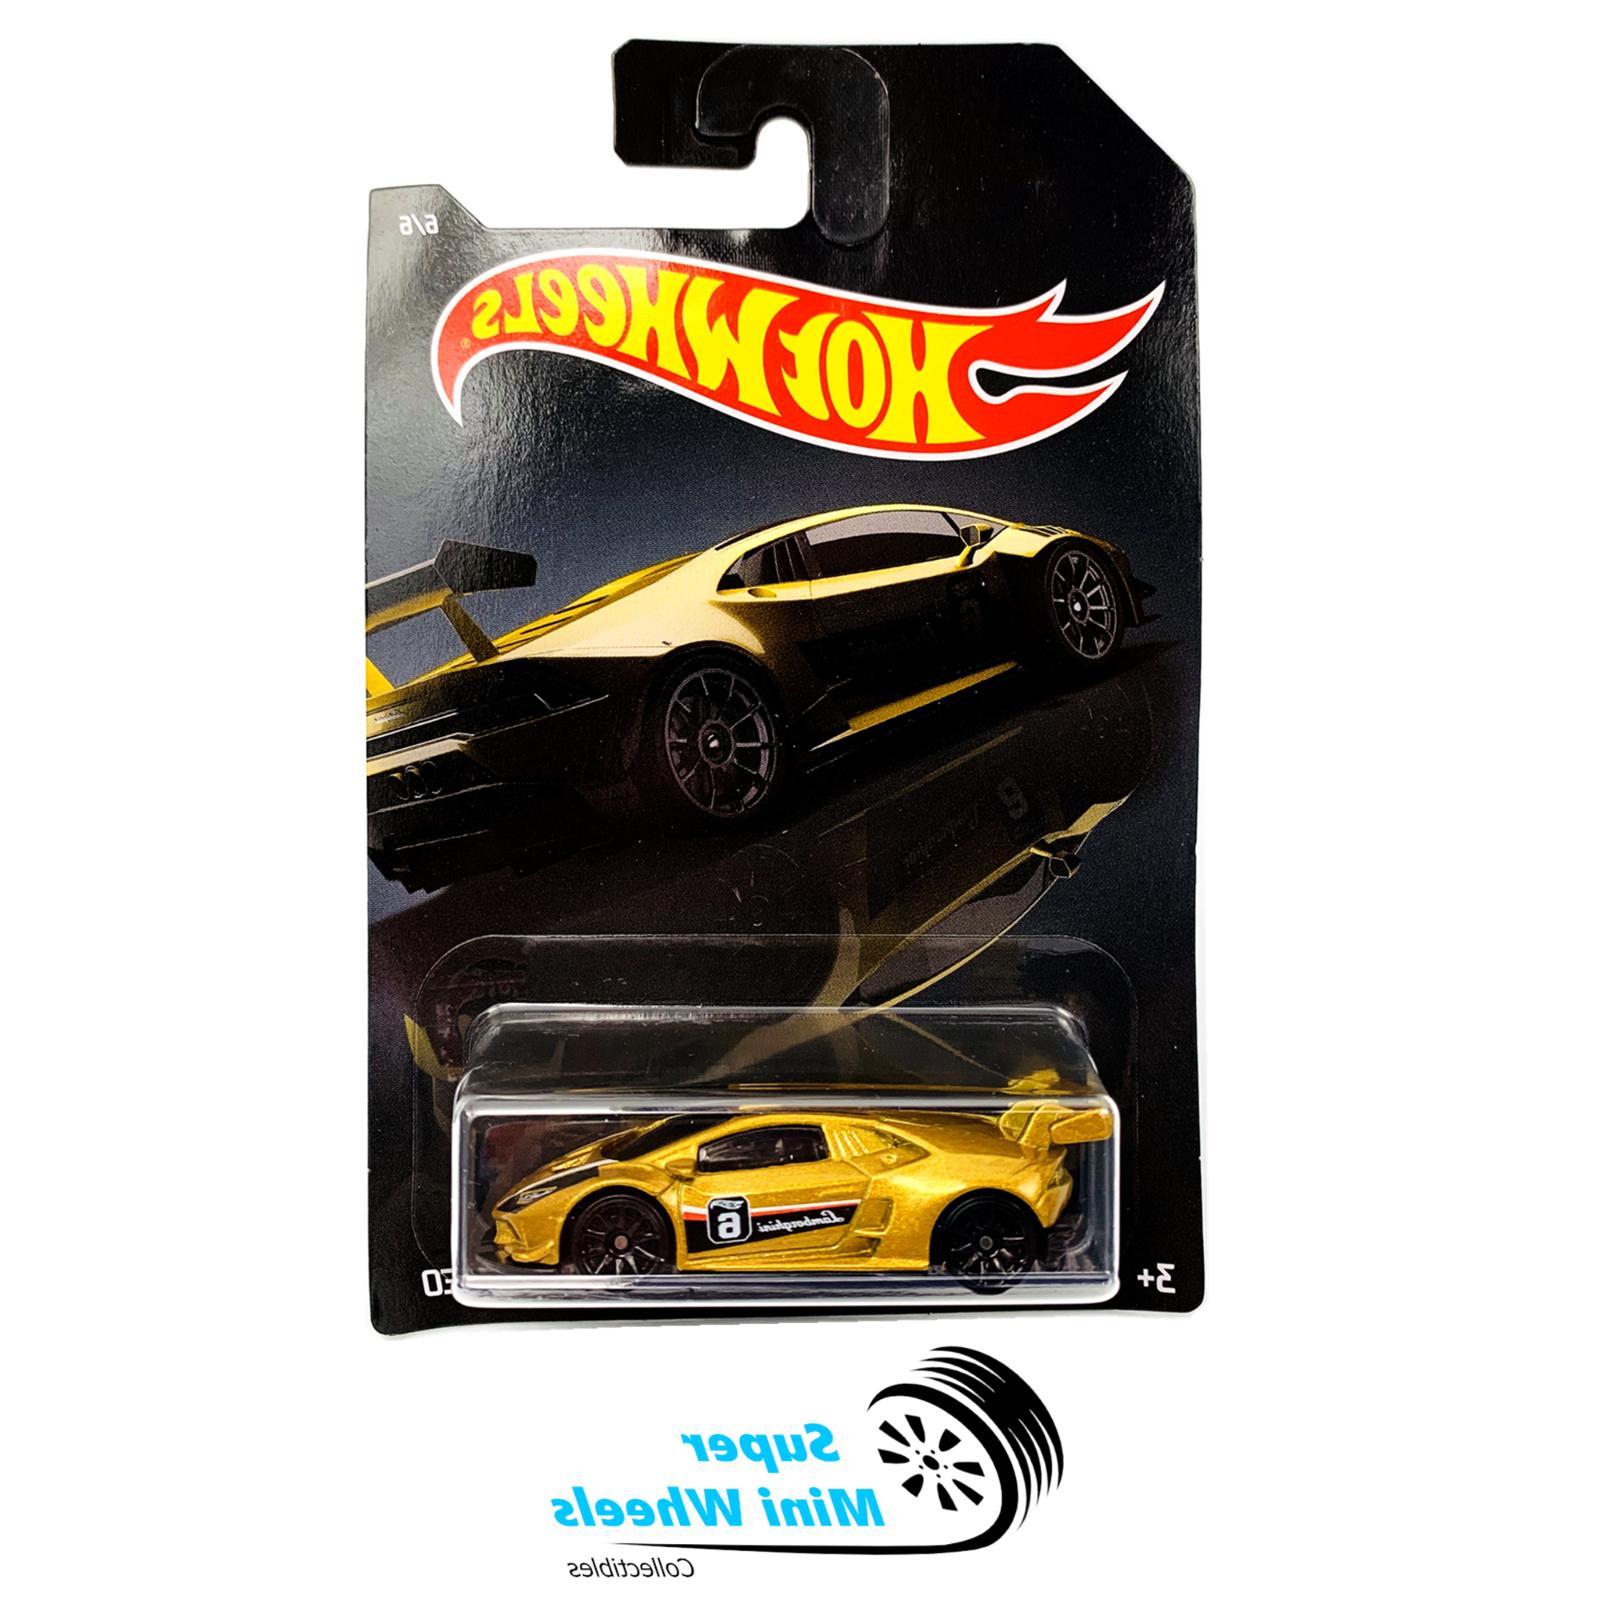 Lot of 2 Hot Wheels Gold LAMBORGHINI LP620-2 & Bentley Conti